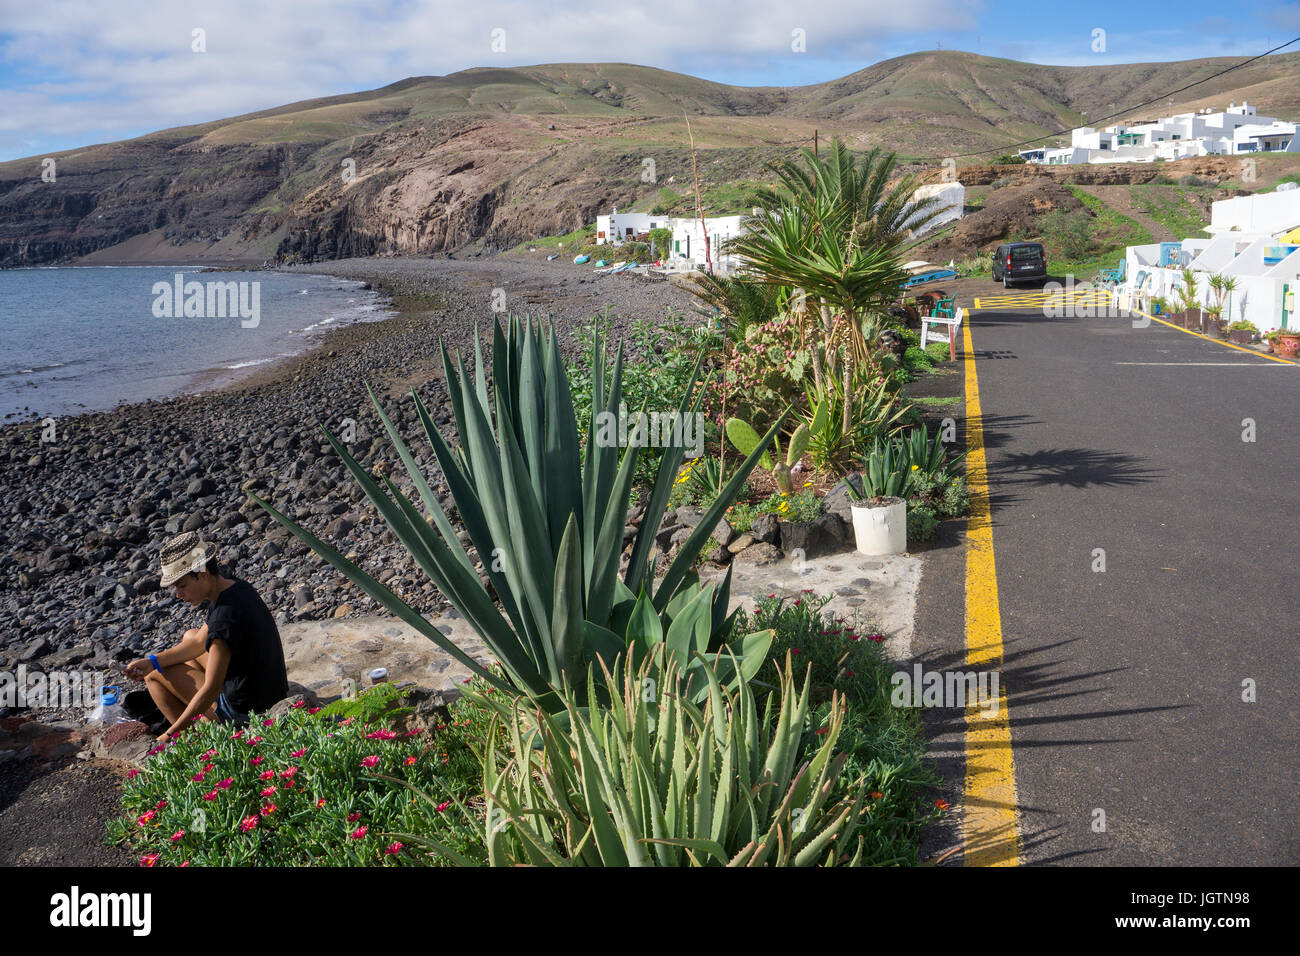 Girl sitting at volcanic pebble beach at the fishing village Playa Quemada, Lanzarote island, Canary islands, Spain, Stock Photo